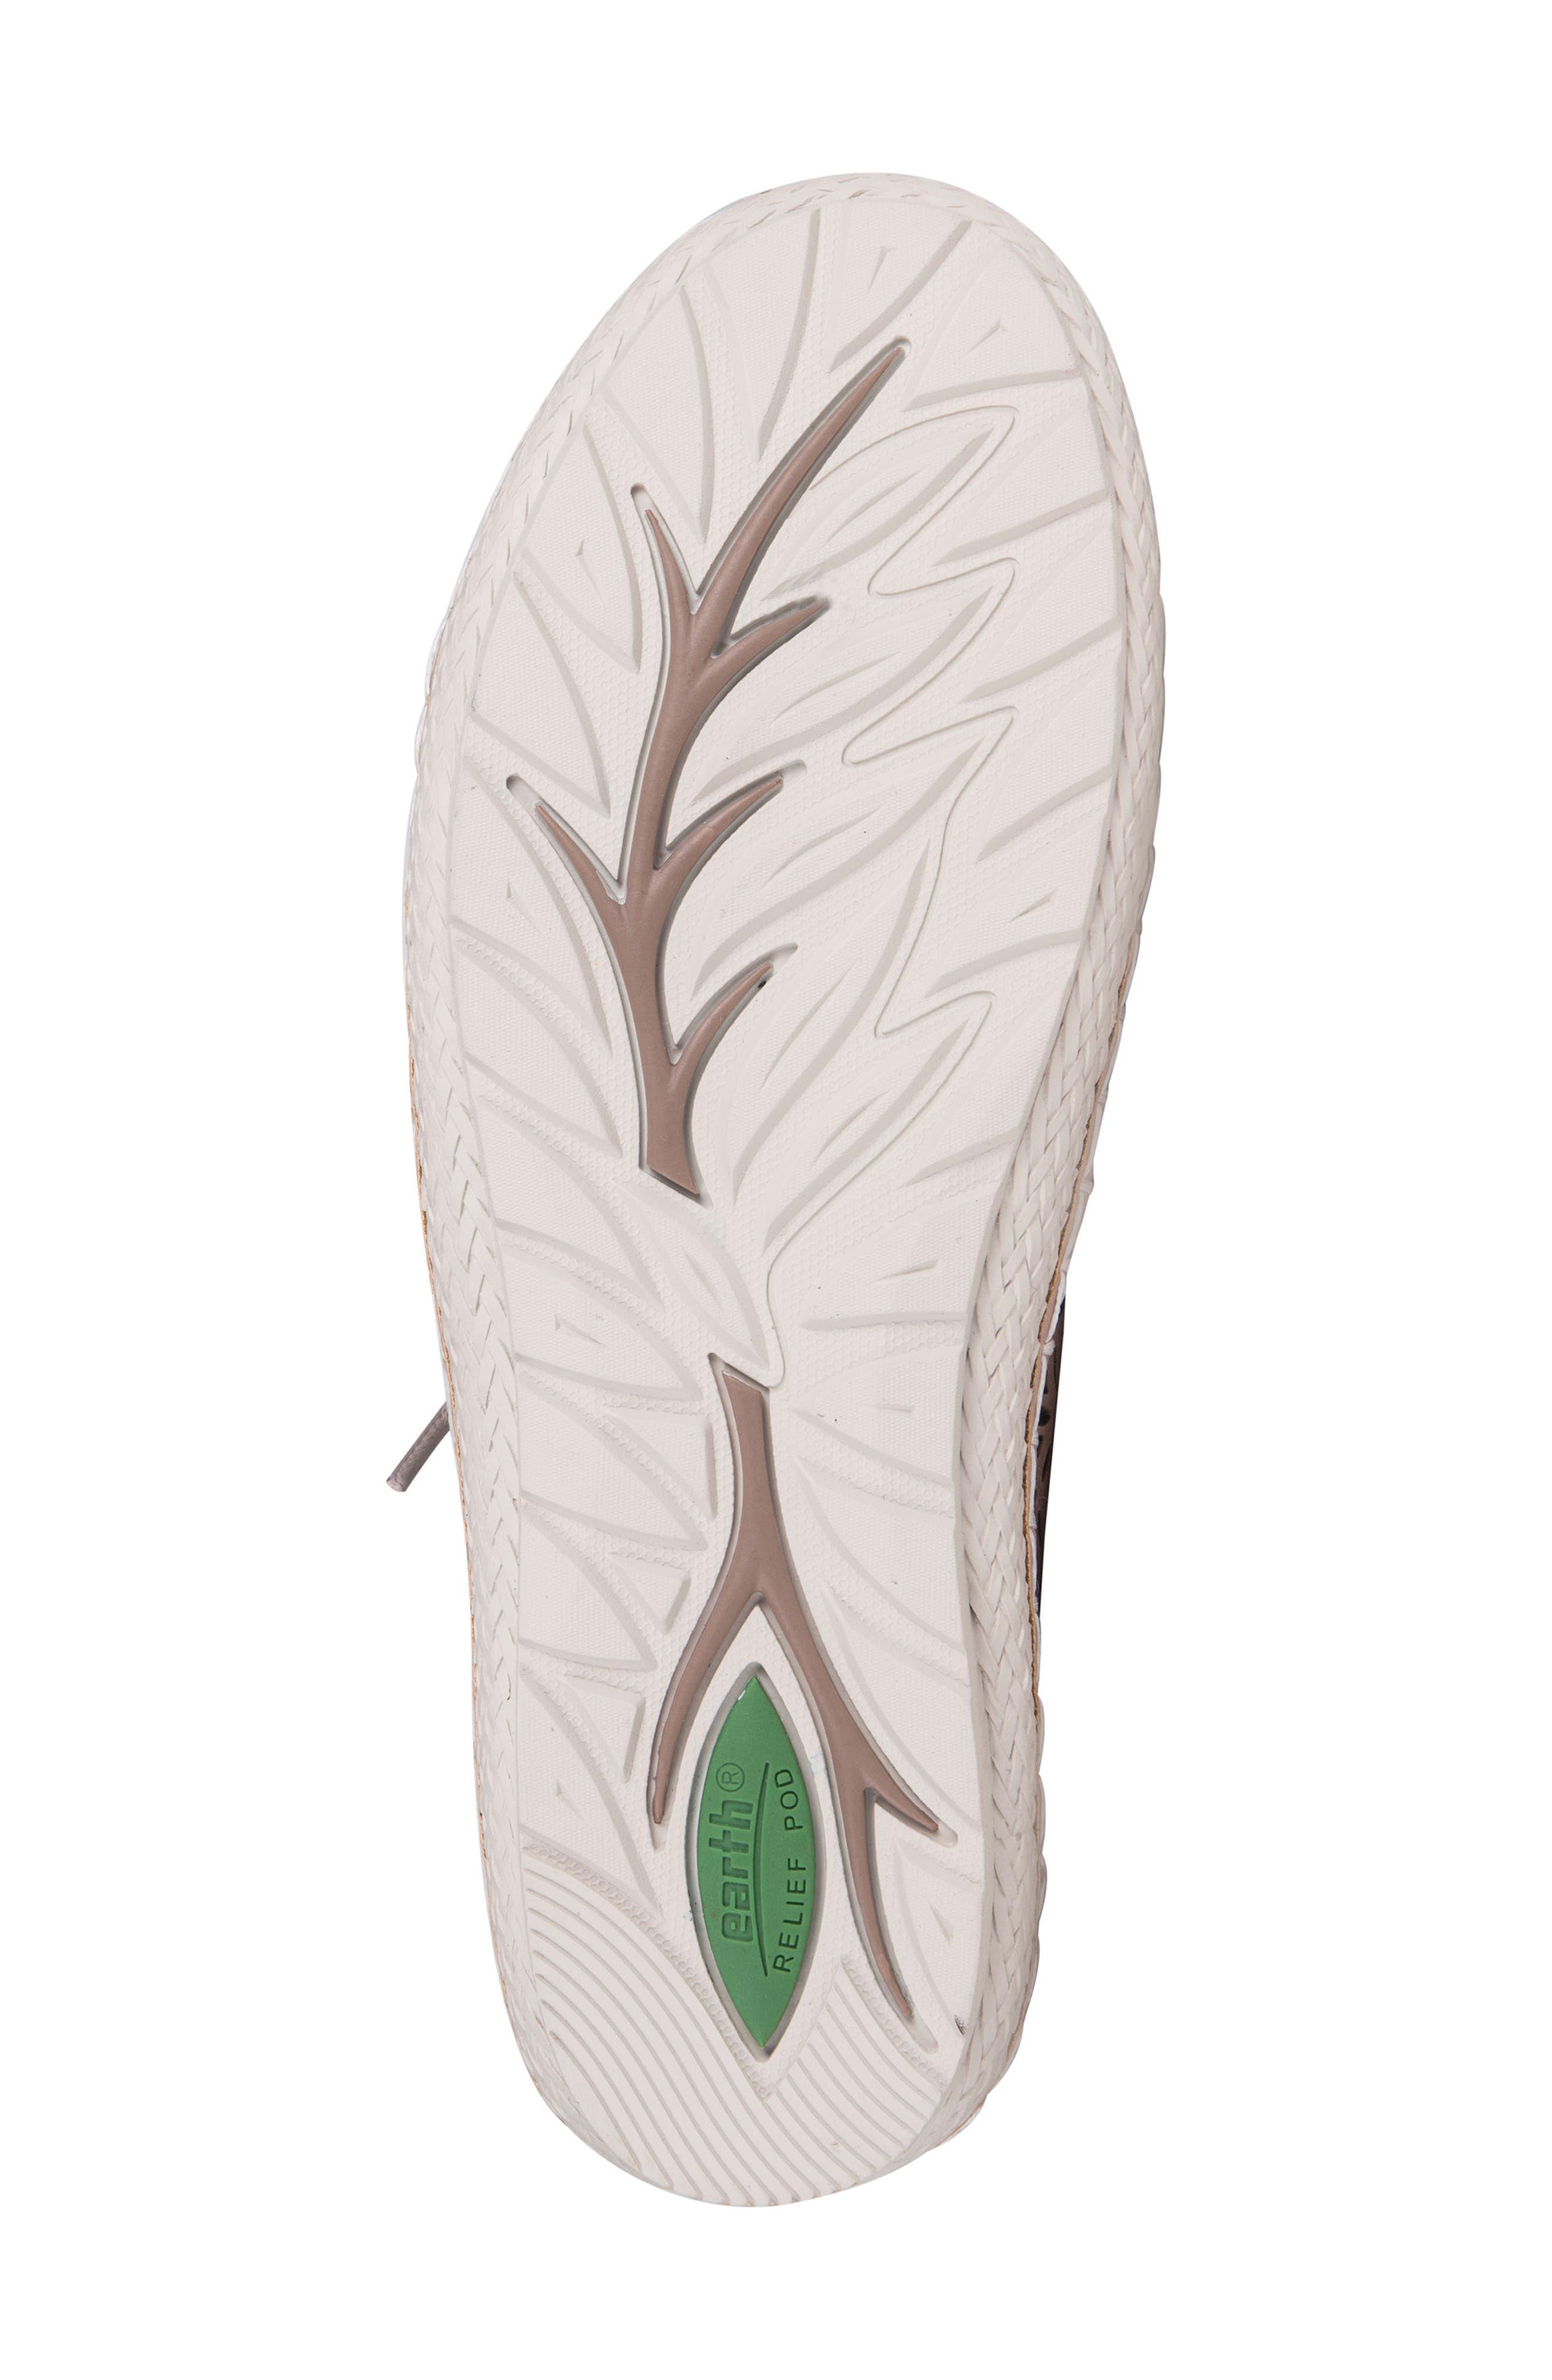 Pax Sneaker,                             Alternate thumbnail 6, color,                             BLUSH LEATHER